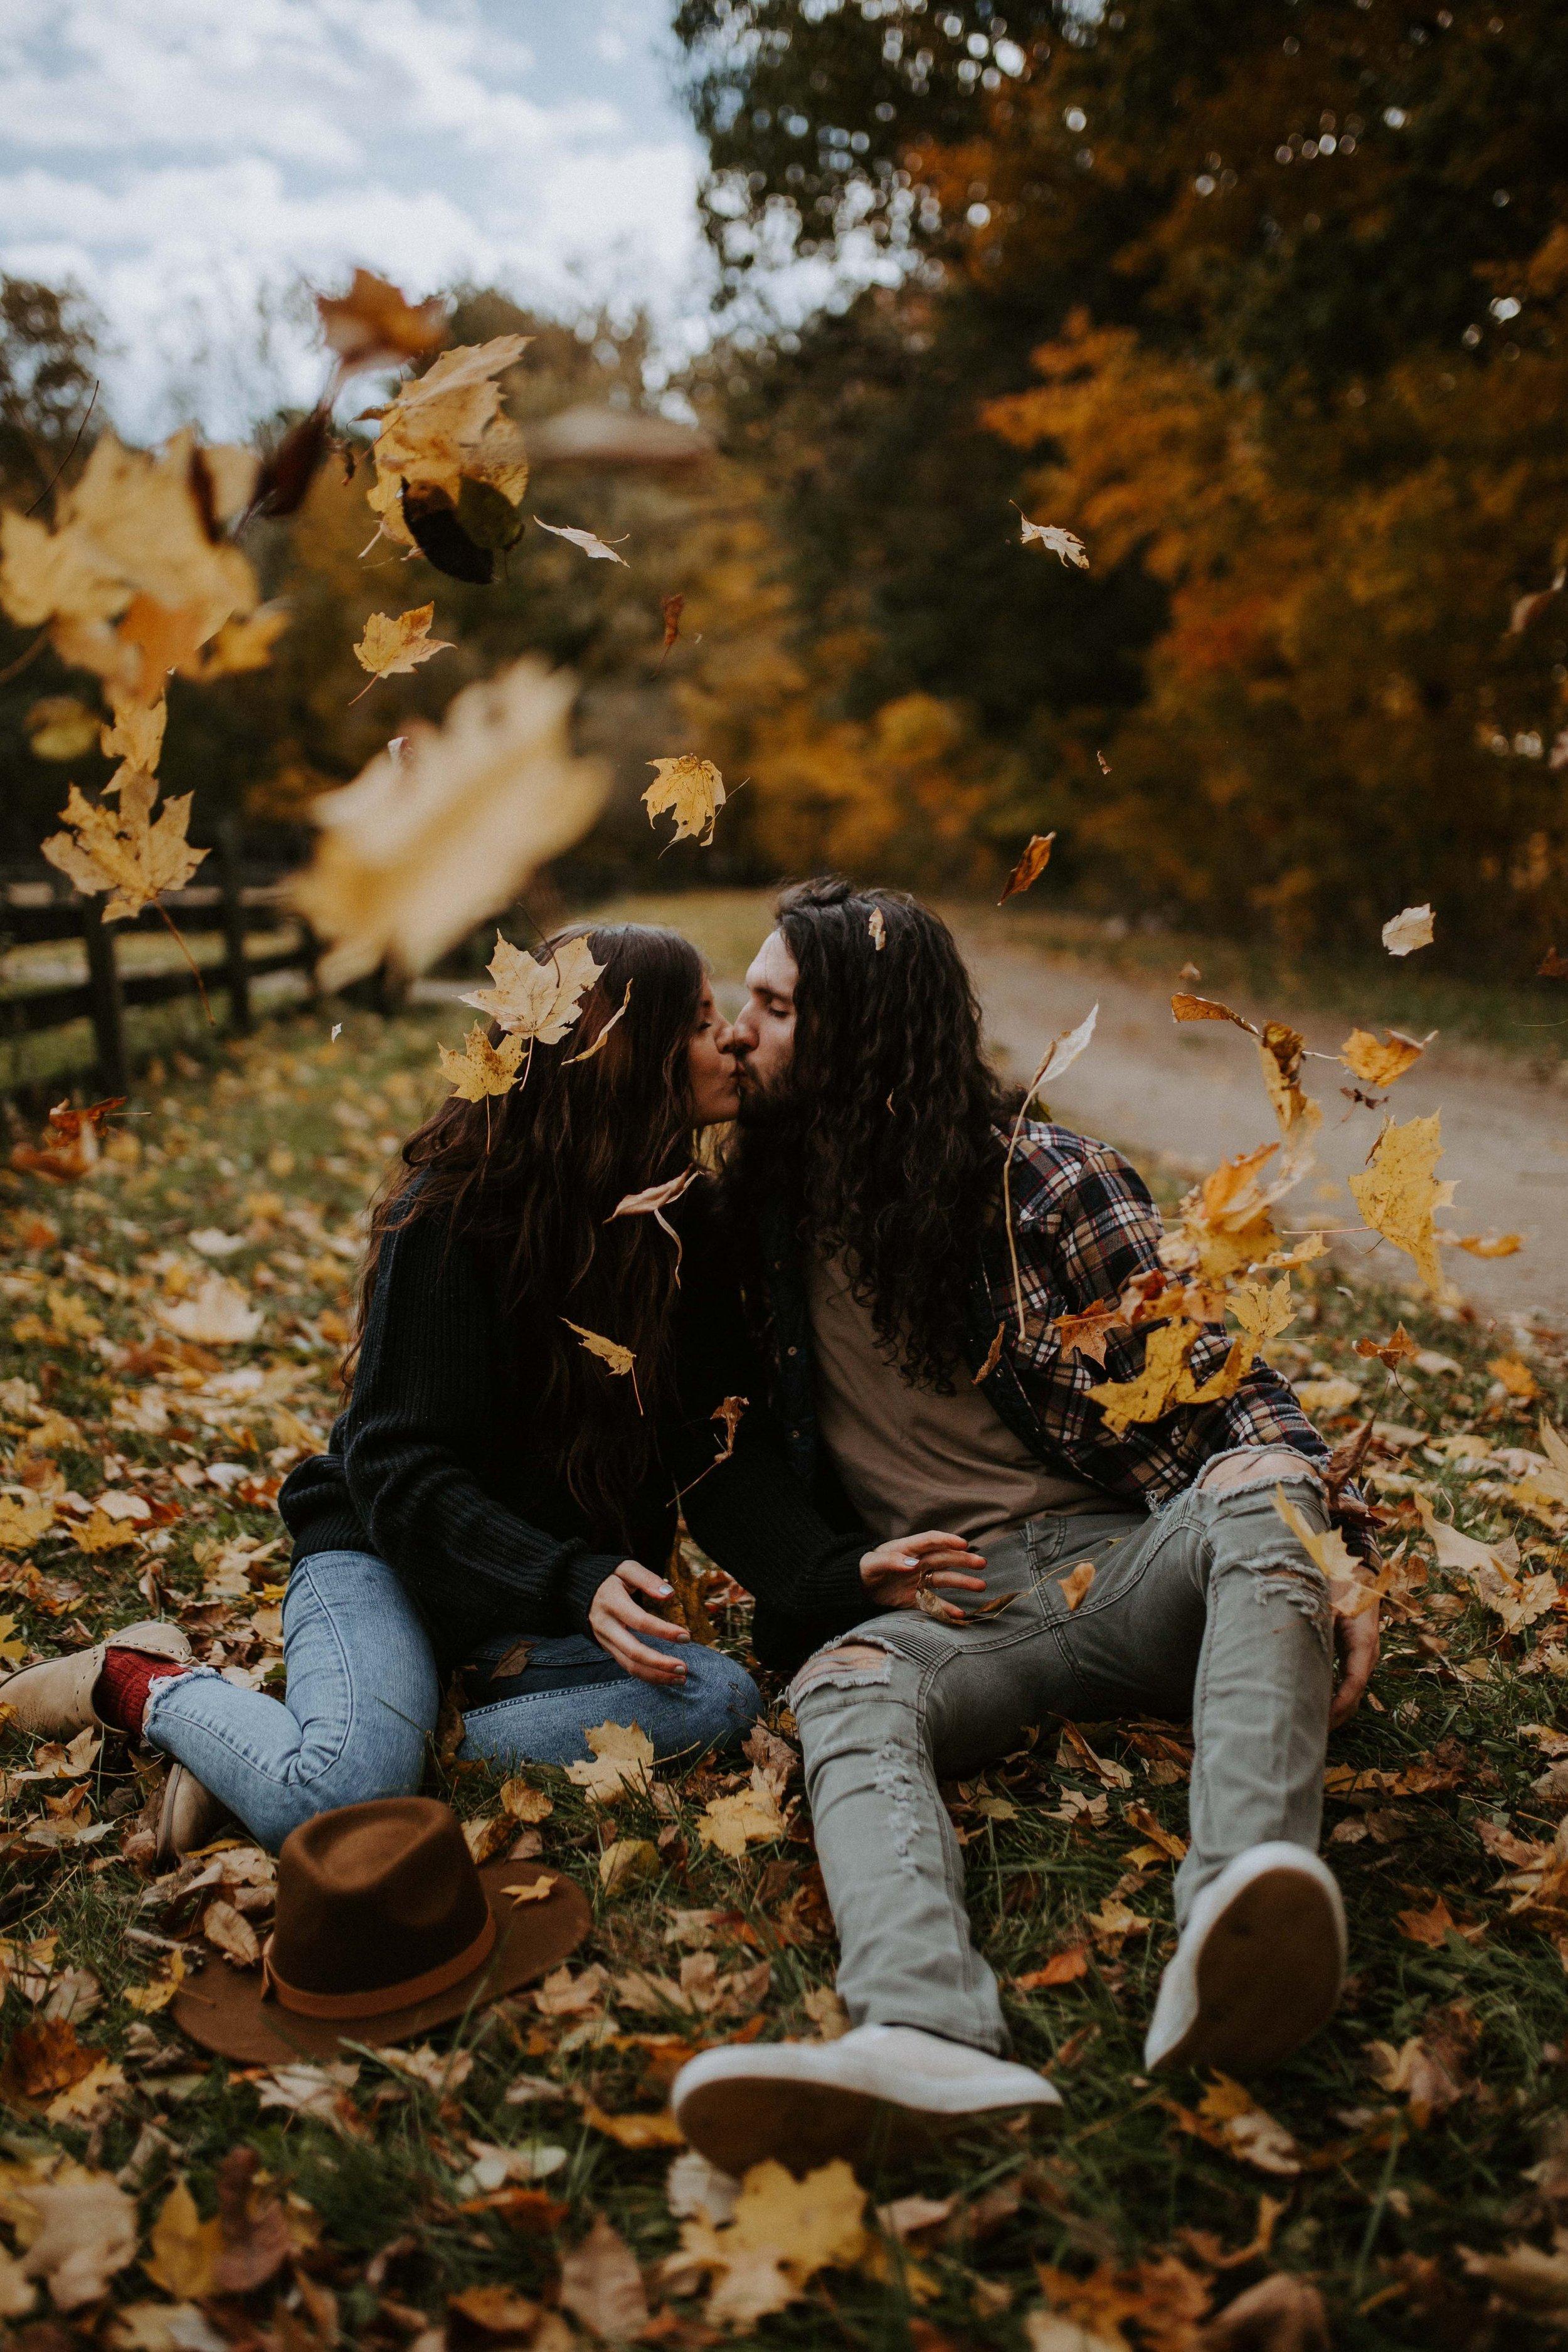 reaganlynnphotography-couplephotography-connerprairie-leximccracken21.jpg